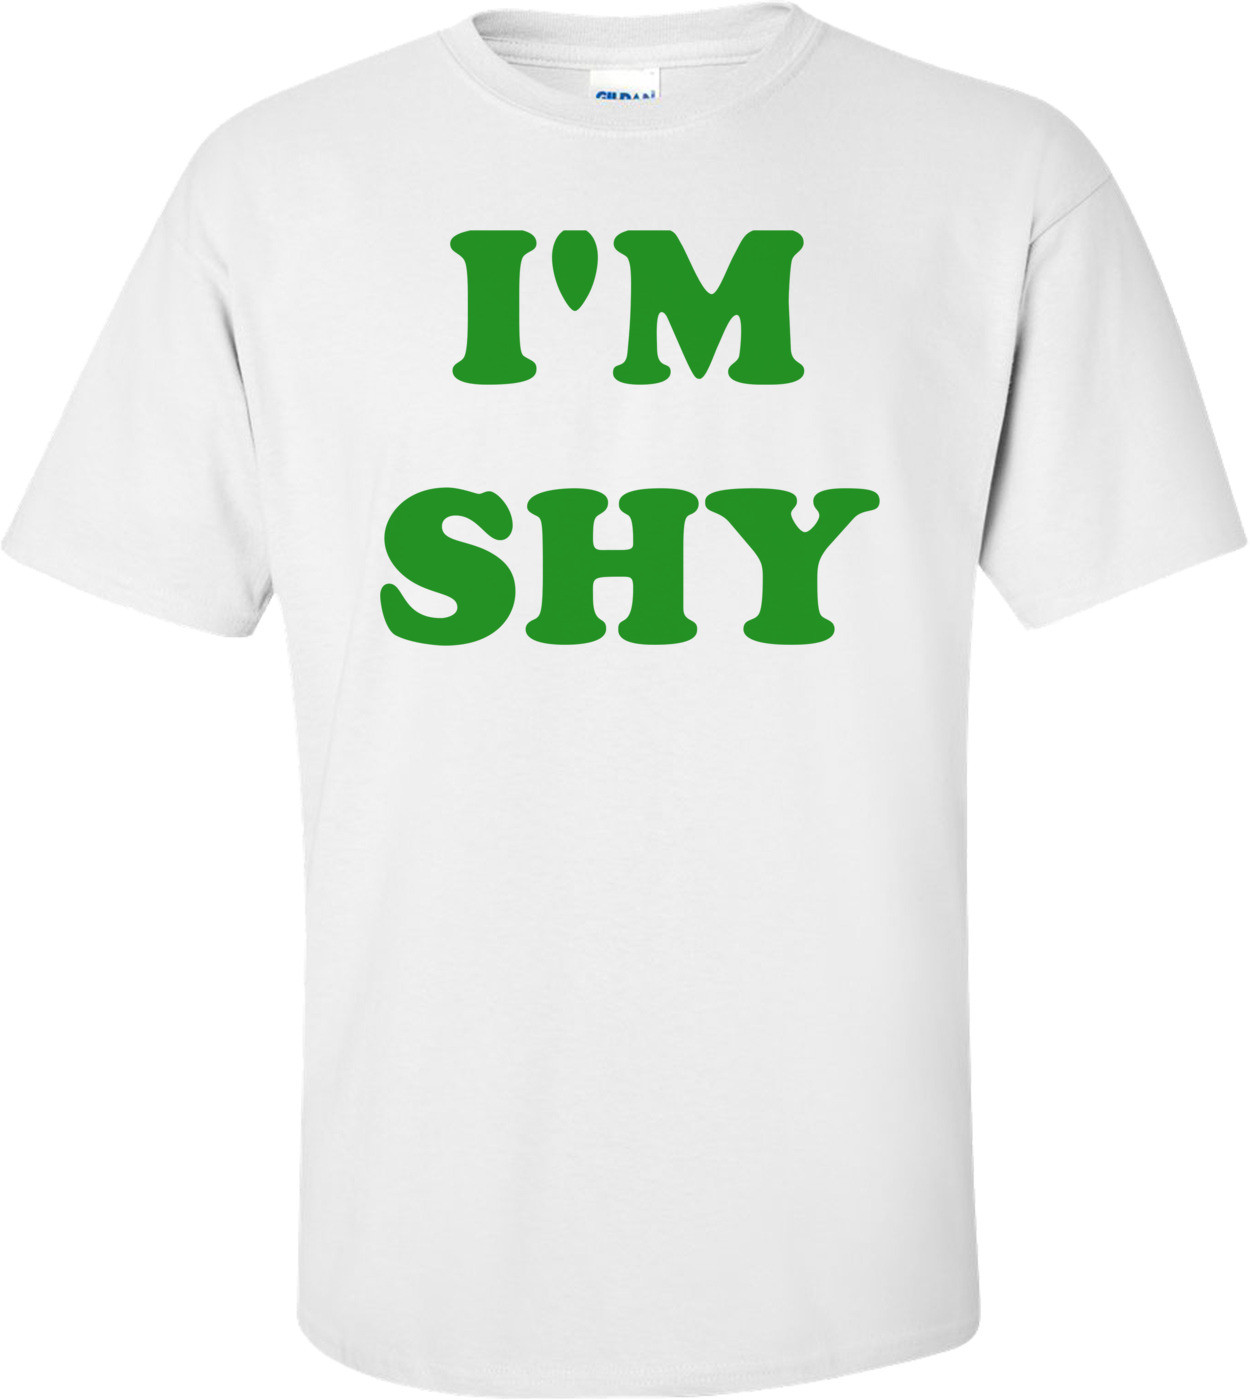 I'M SHY Shirt